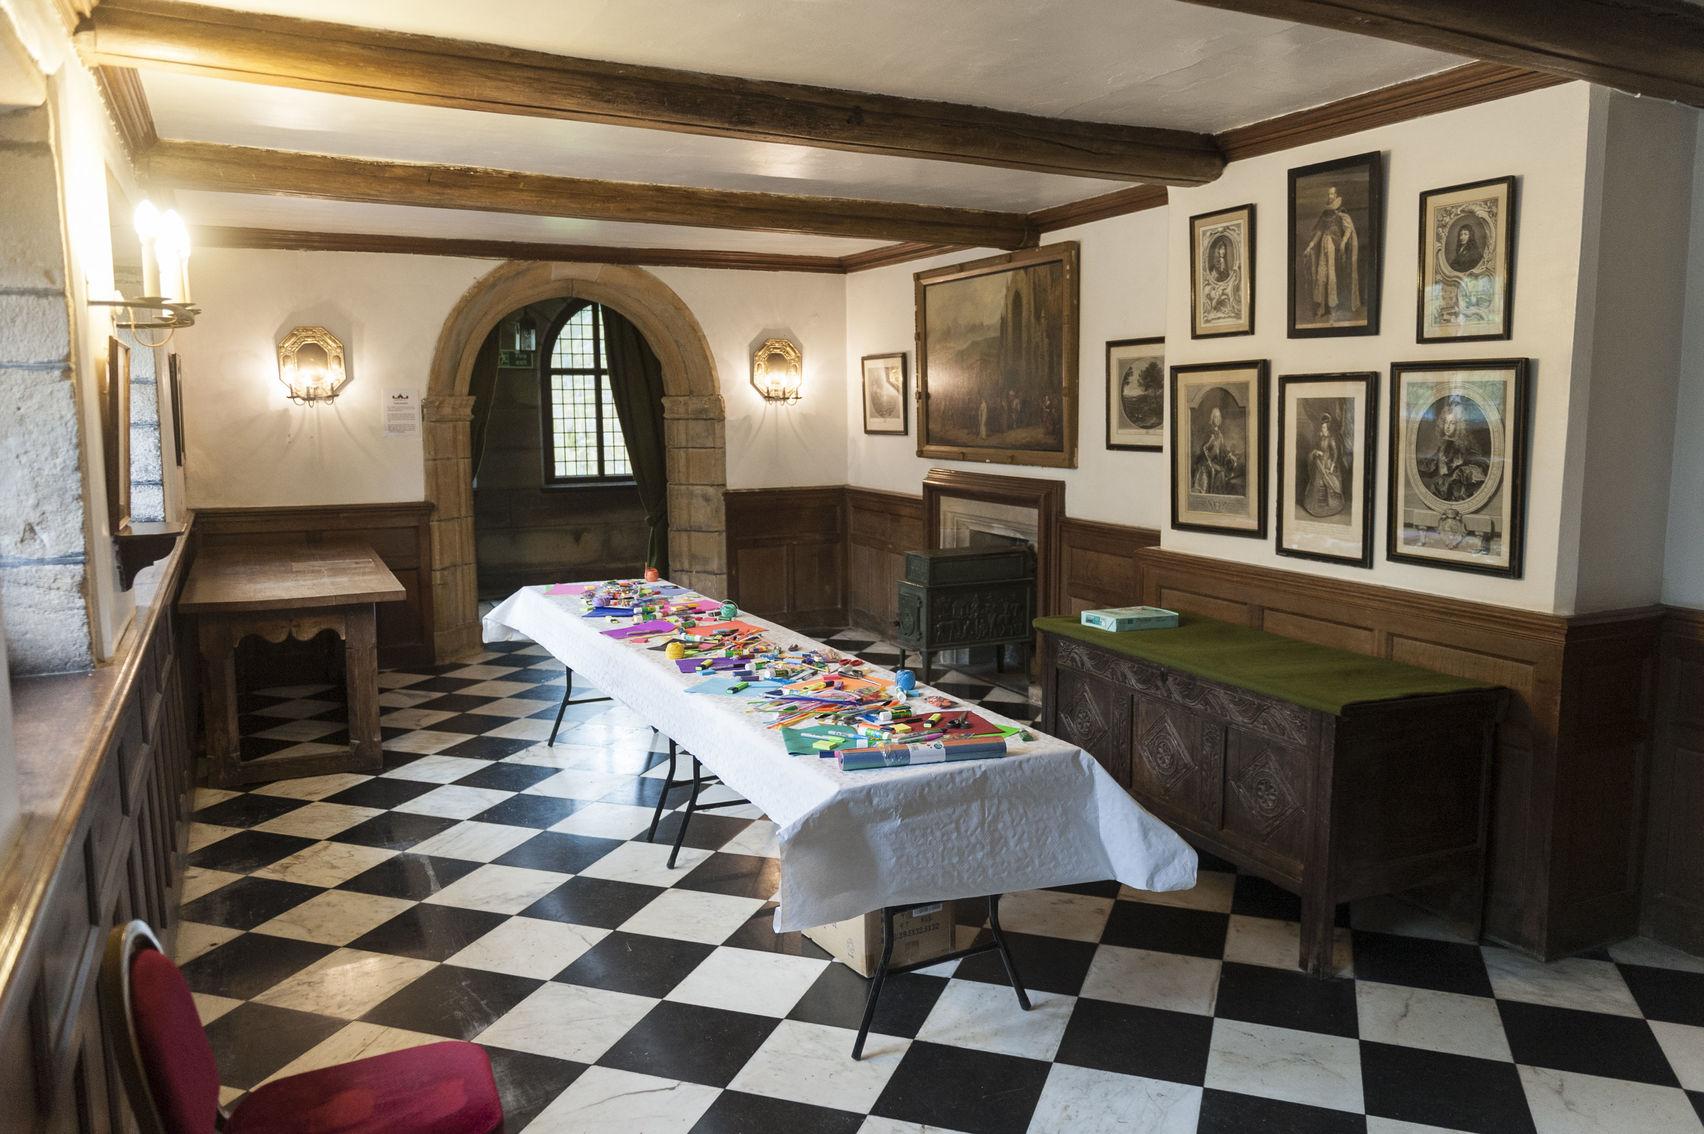 The Smoking Room & King's Hall, Hoghton Tower